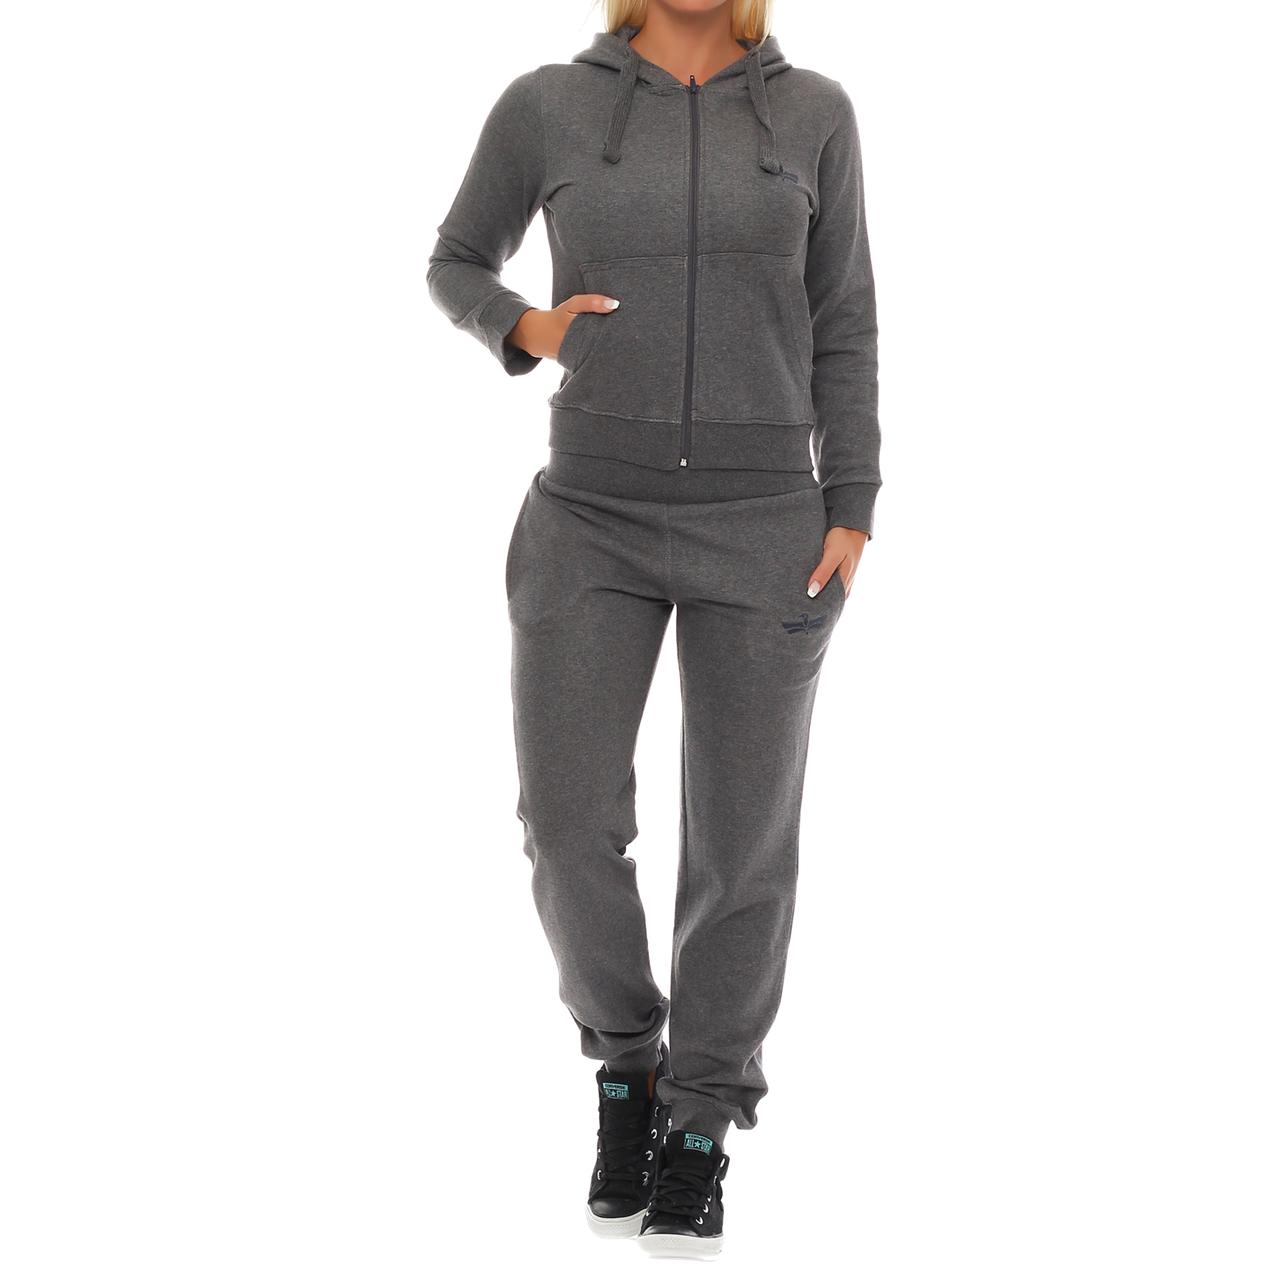 finchgirl ladies sports suit damen jogging anzug trainingsanzug sportanzug ebay. Black Bedroom Furniture Sets. Home Design Ideas